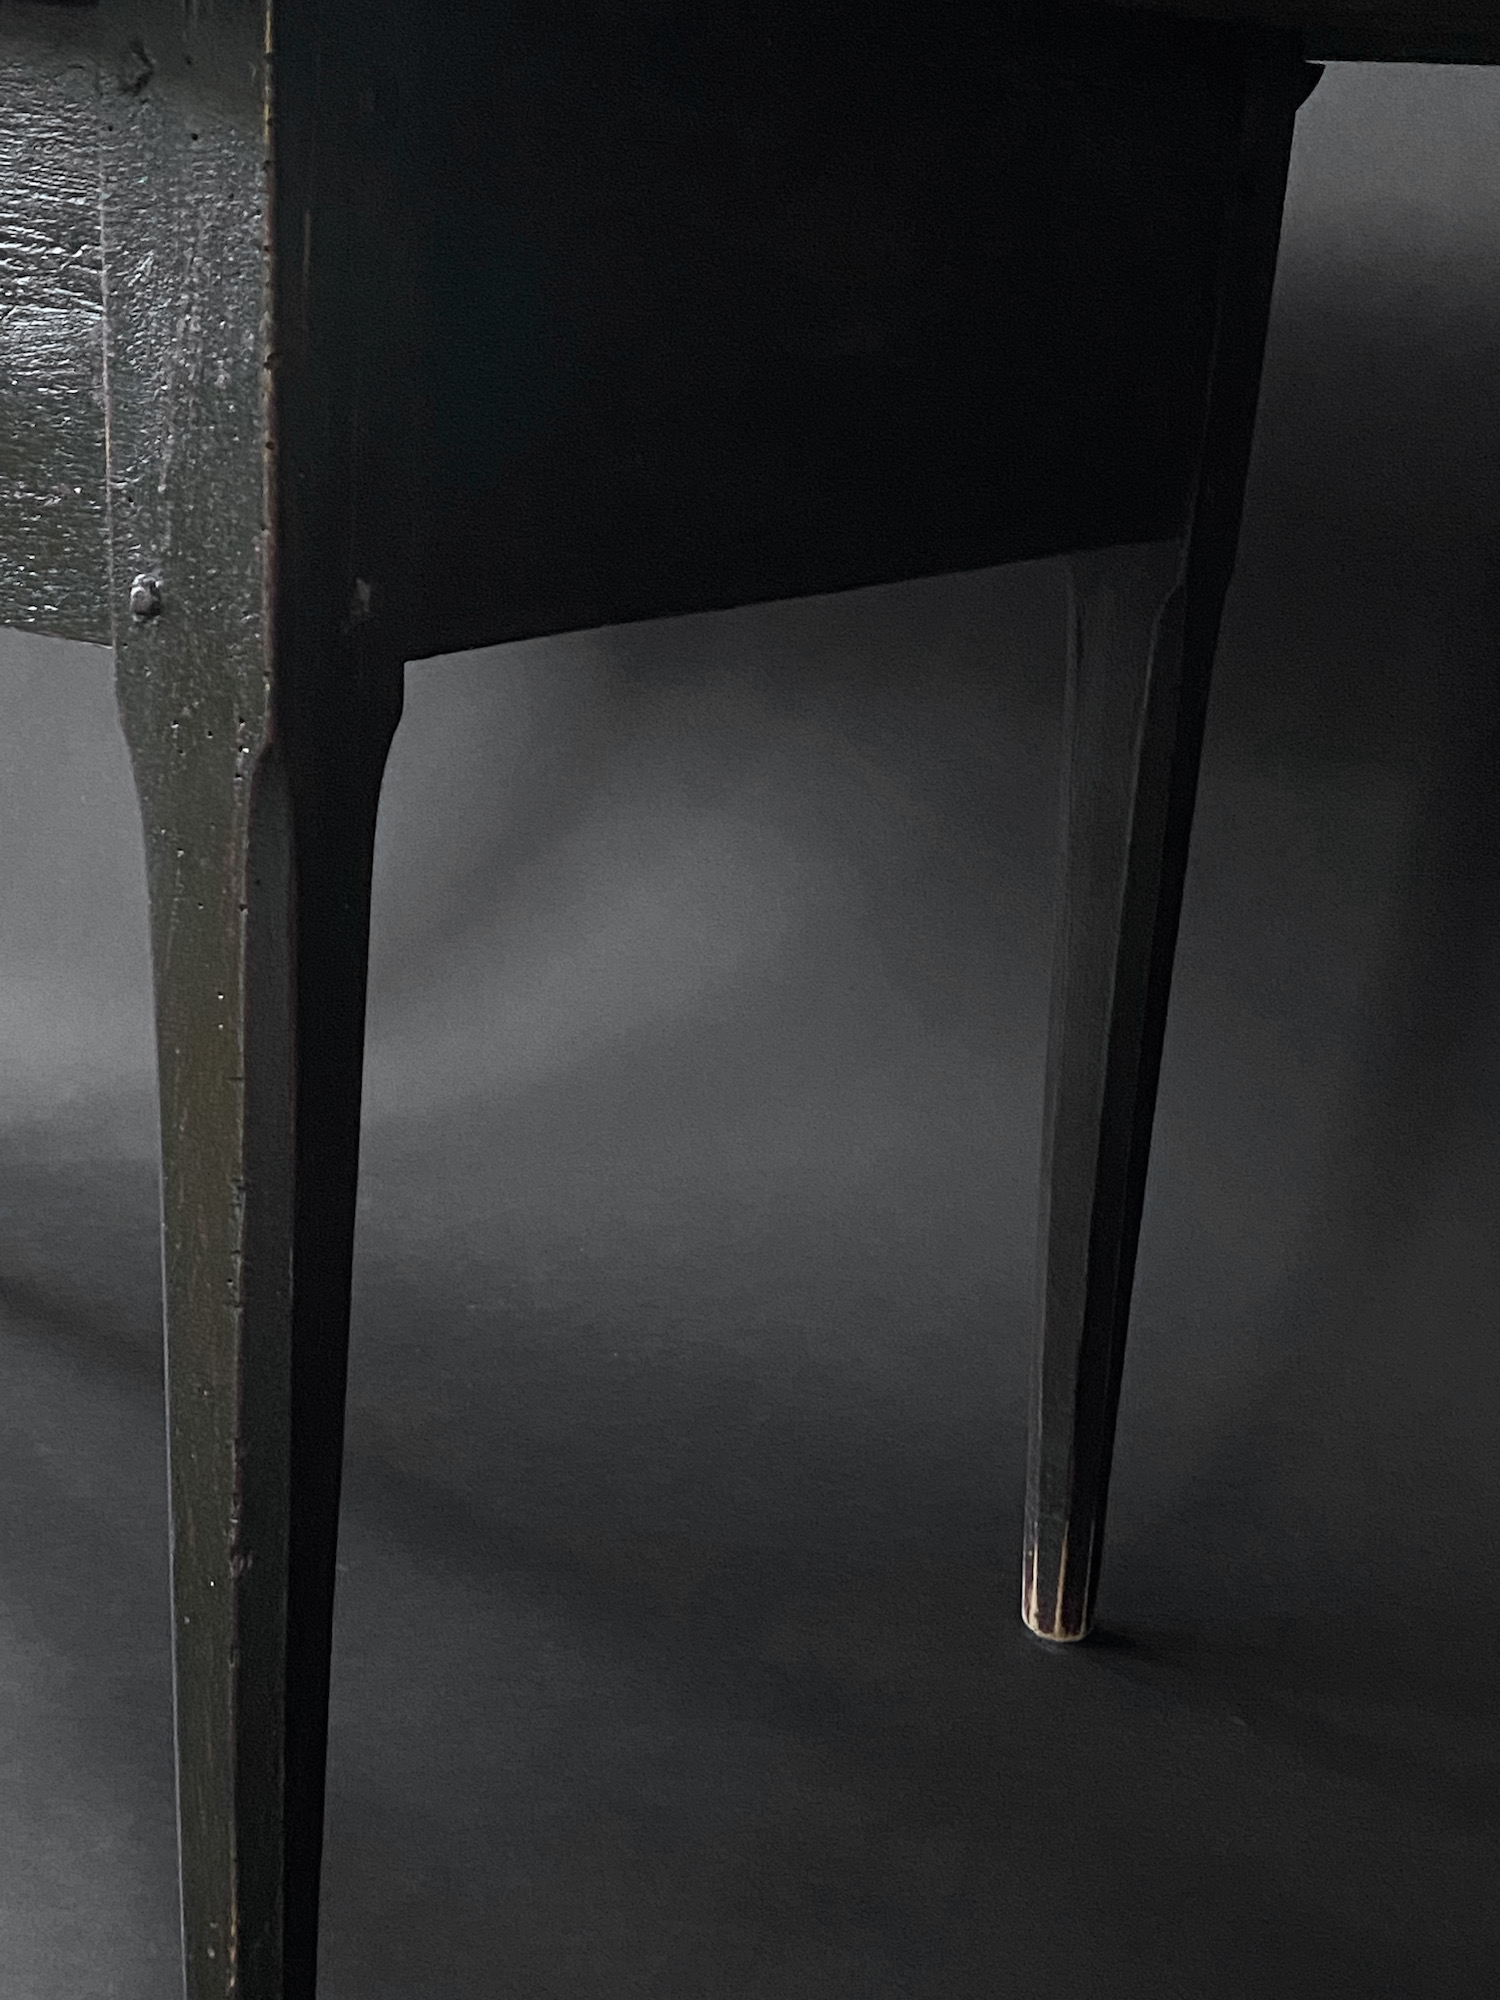 21062101x – 5